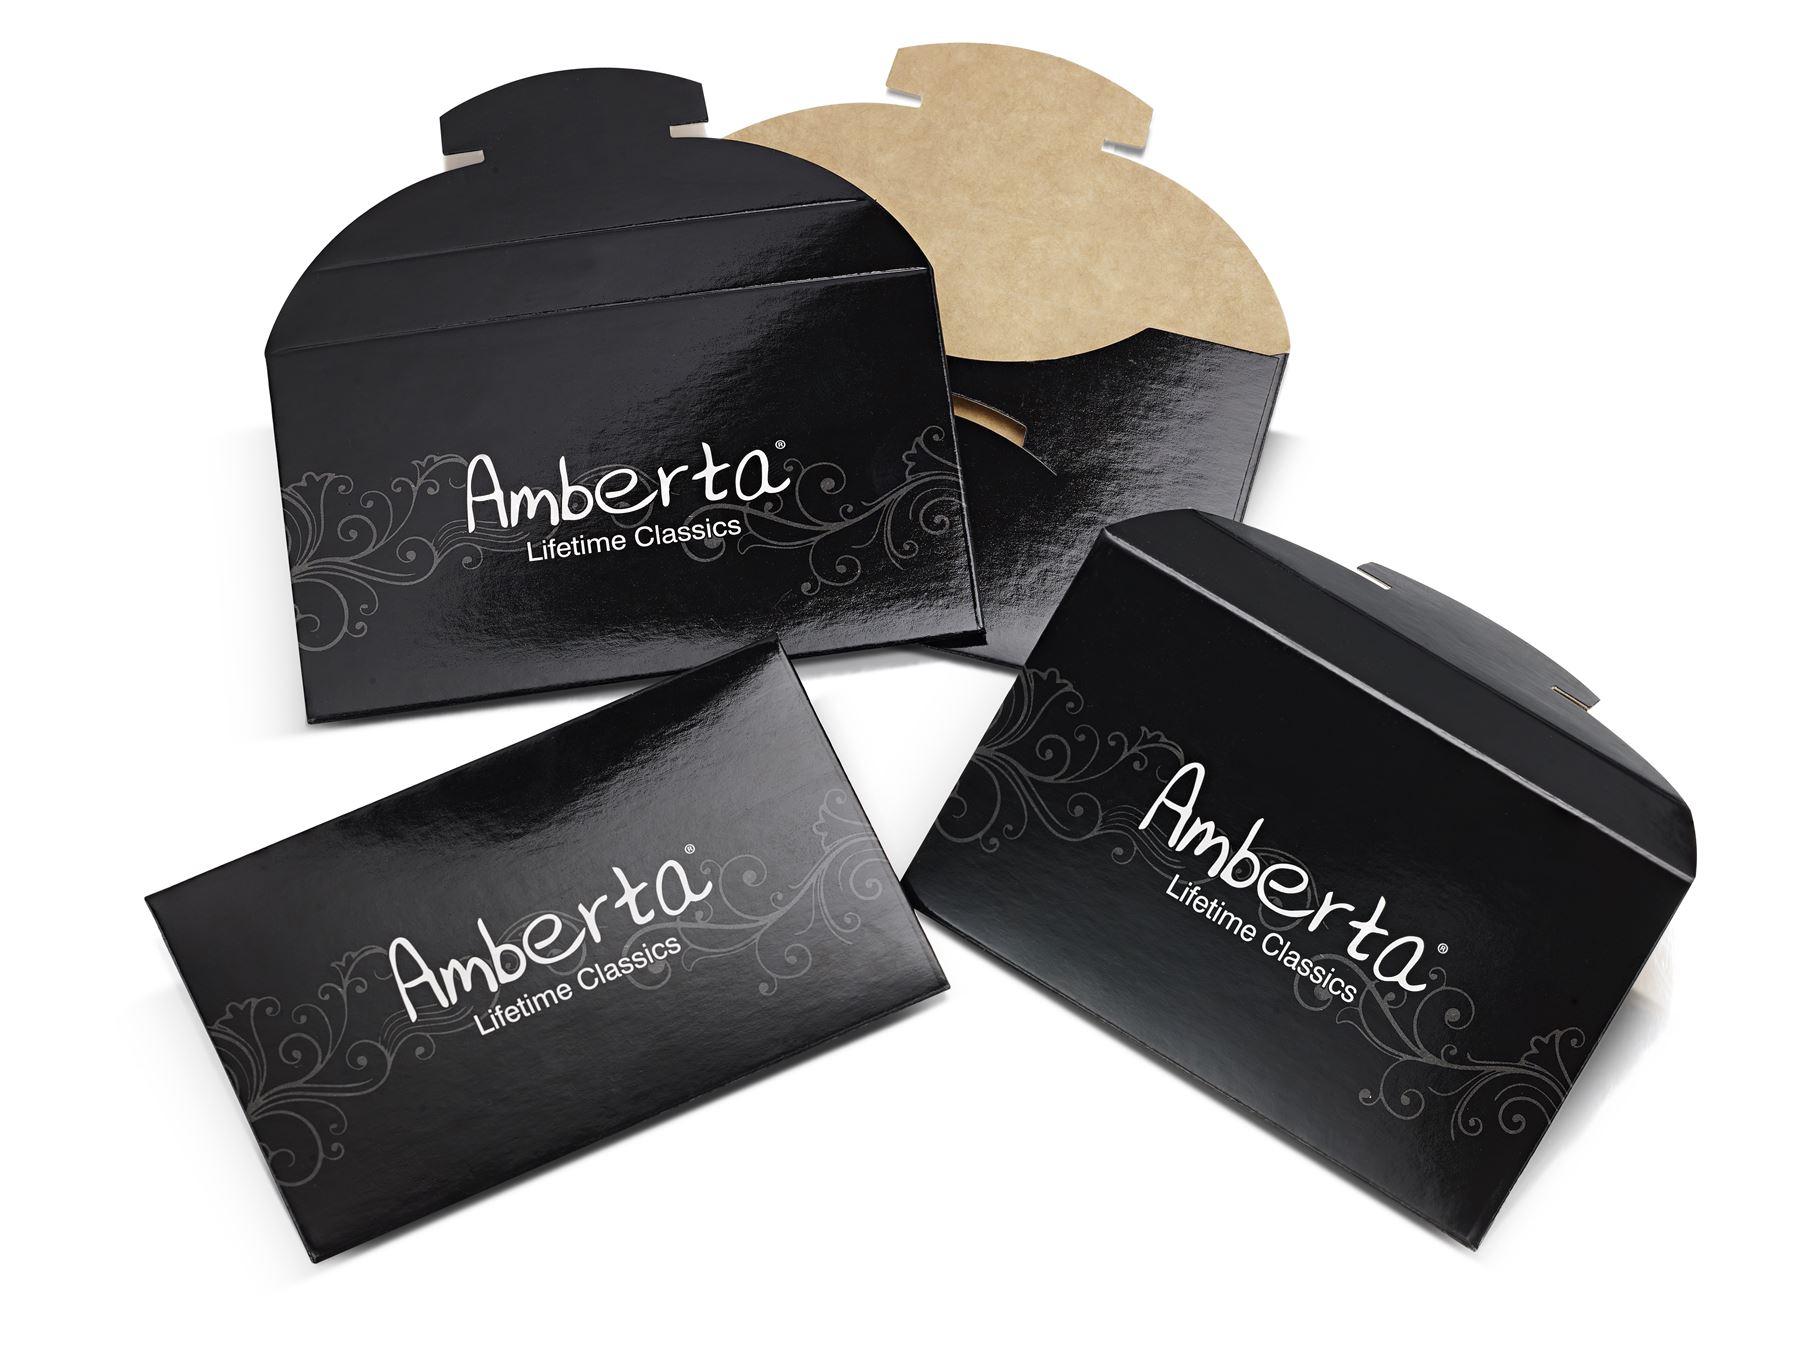 Amberta-Jewelry-925-Sterling-Silver-Adjustable-Bracelet-Italian-Bangle-for-Women thumbnail 19